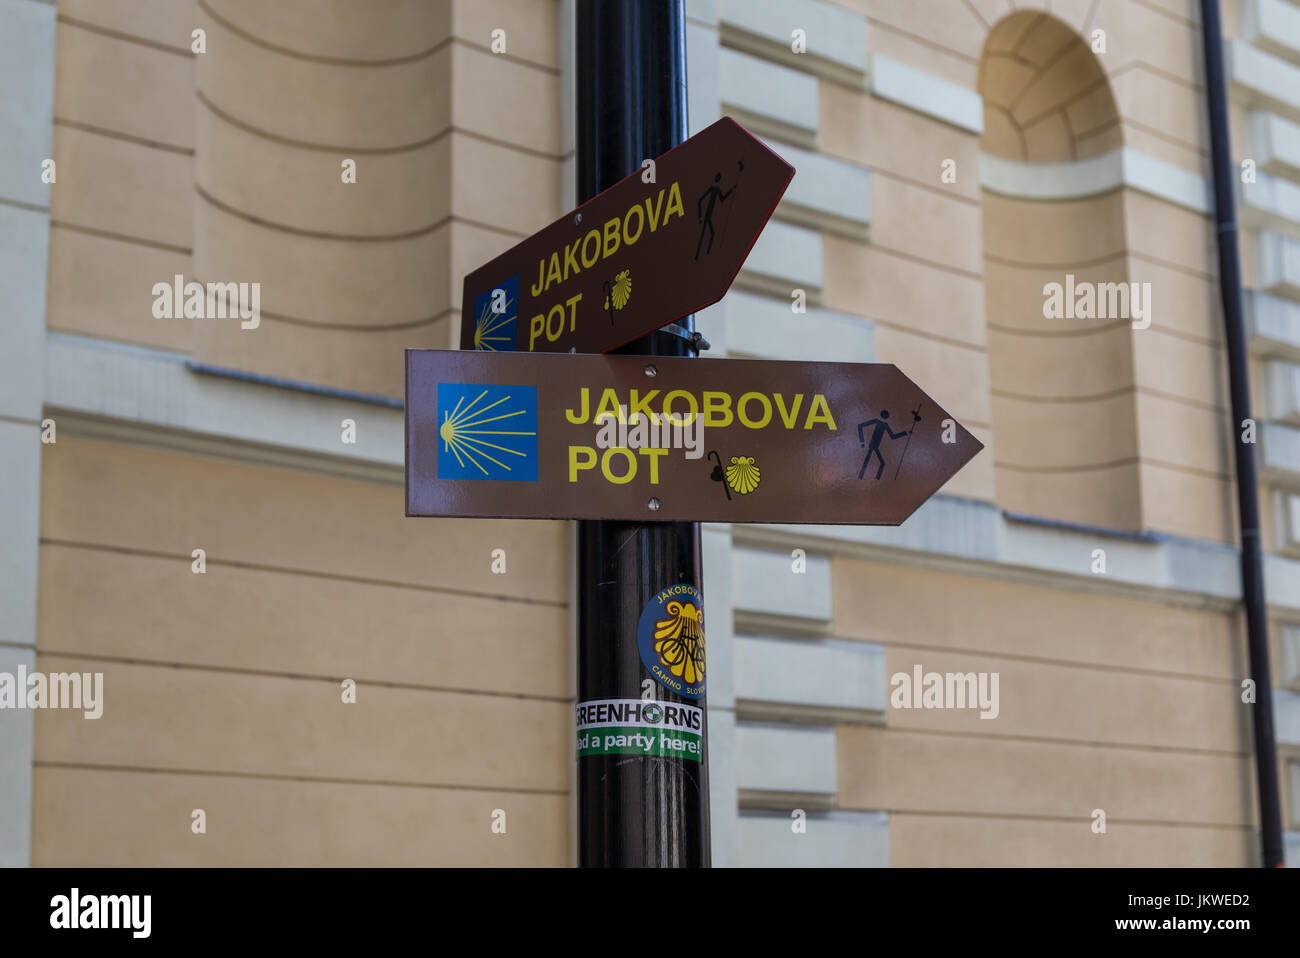 A post marking the Way of St. James In Slovene: Jakobova pot), Ljubljana, Slovenia - Stock Image